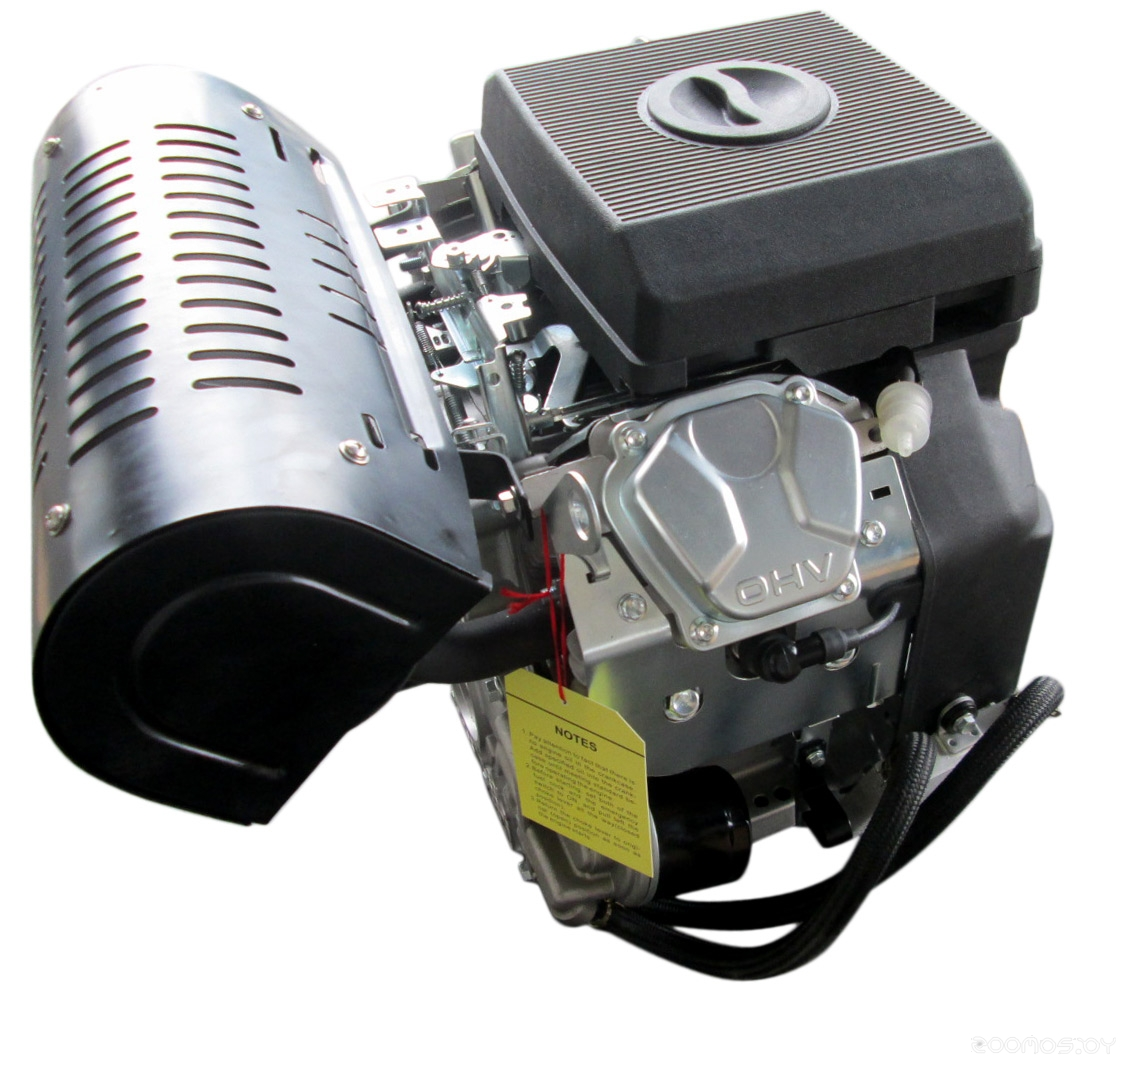 Двигатель Zigzag GX 670 (SR2V78)